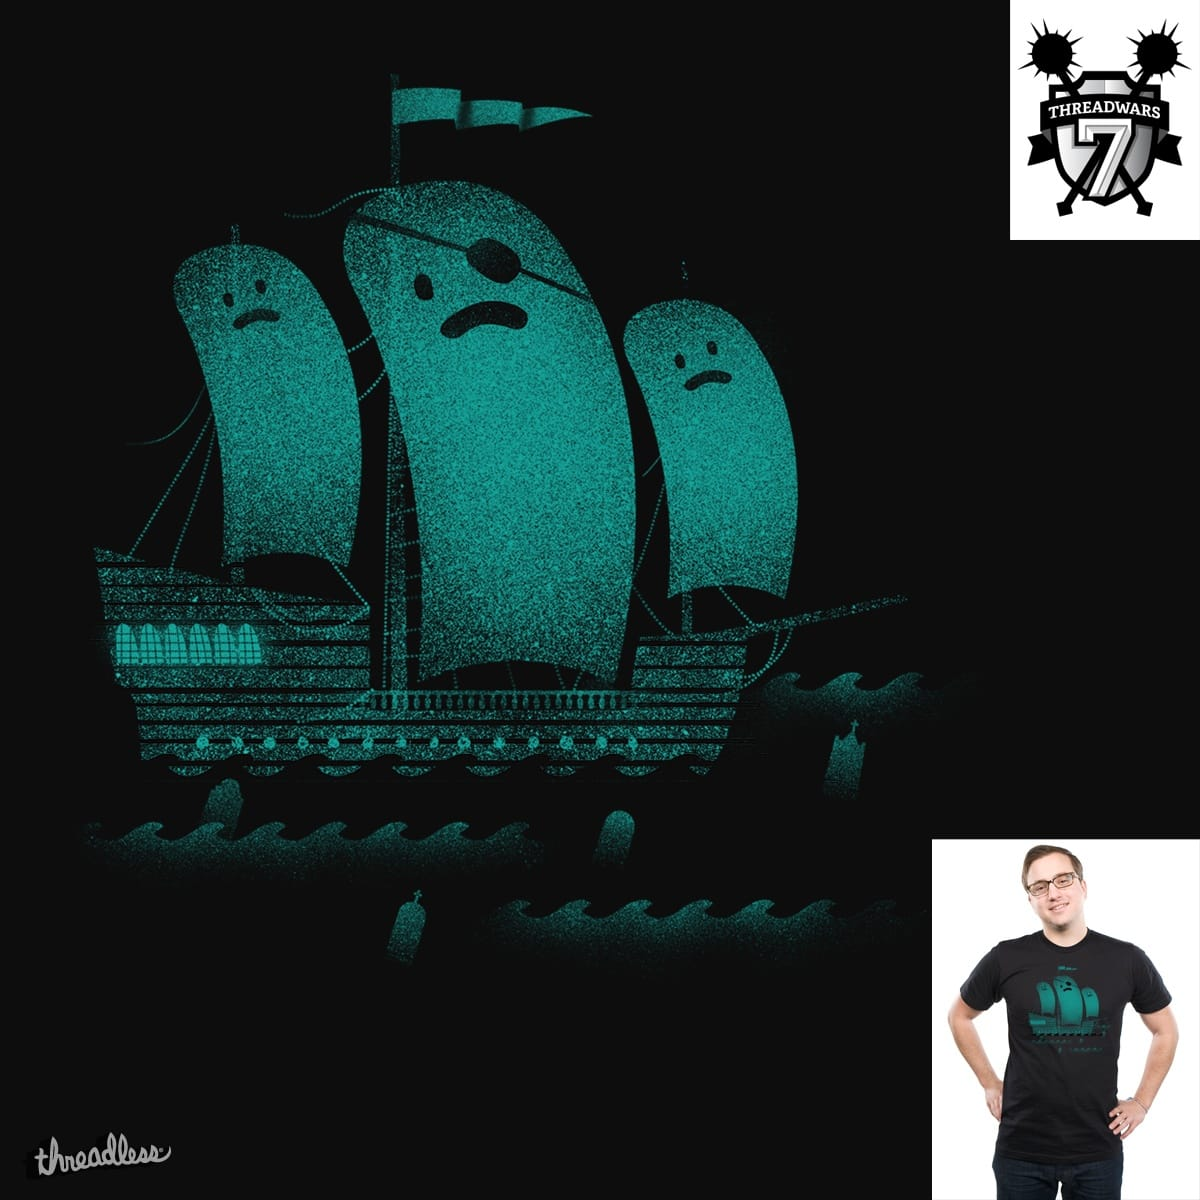 Ghost ship by Wharton on Threadless